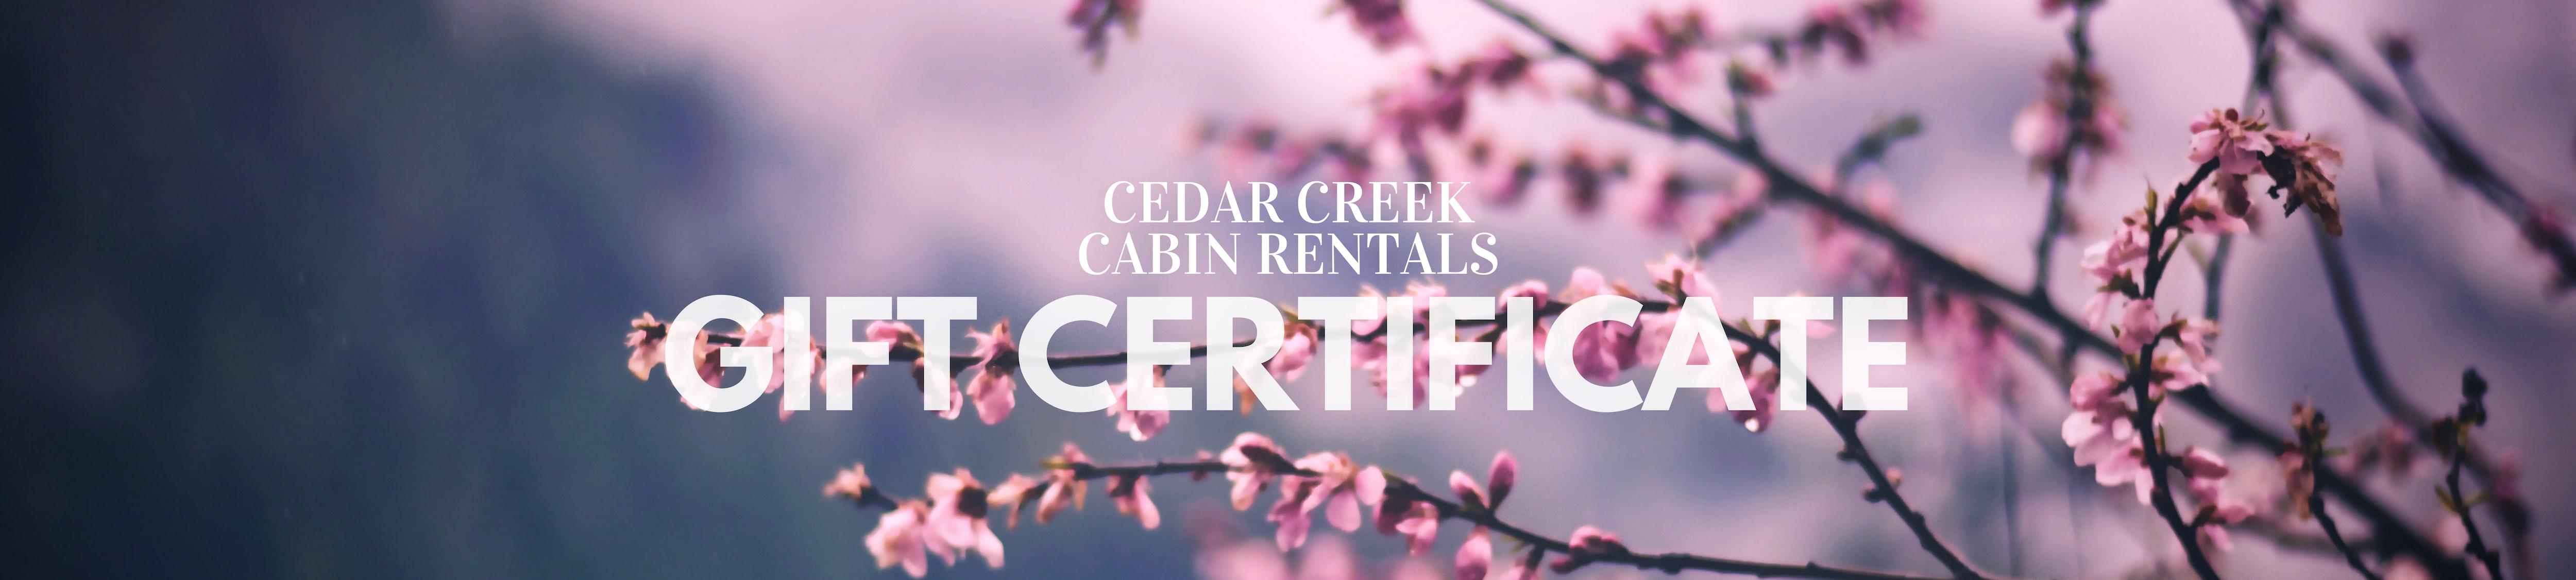 Spring-Gift-Certificate-Cedar-Creek-Cabin-Rentals-Helen-Georgia-Banner-Photo-by-nikhil-kumar-231465-unsplash